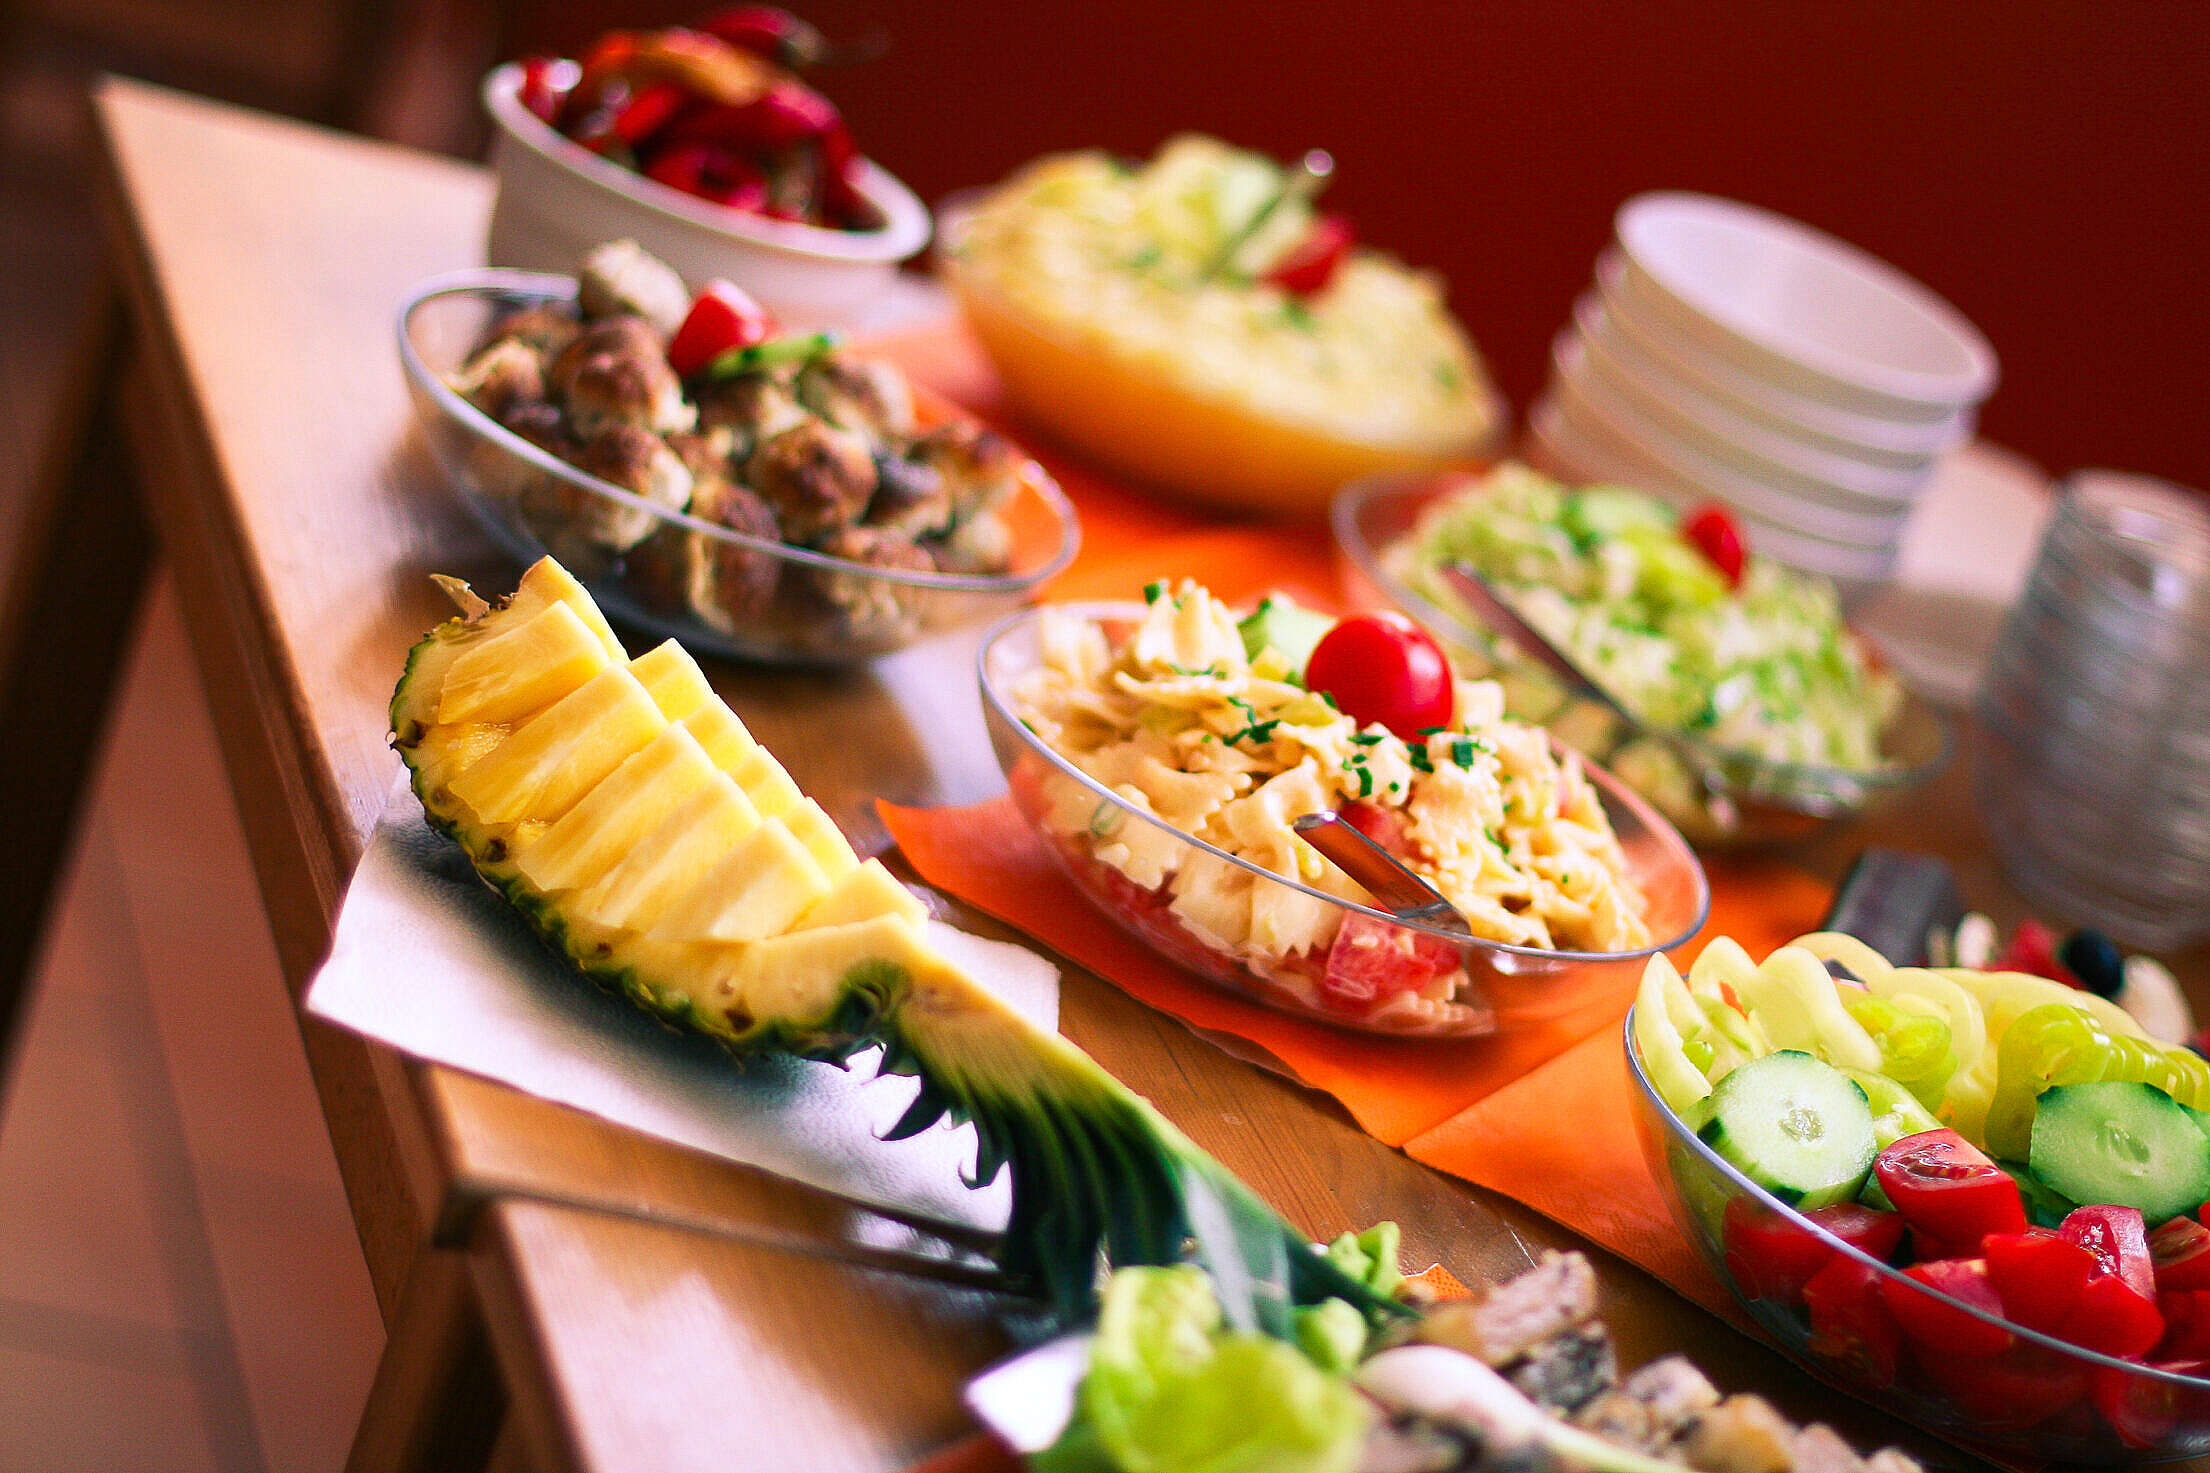 Ananas Fresh Table Free Stock Photo